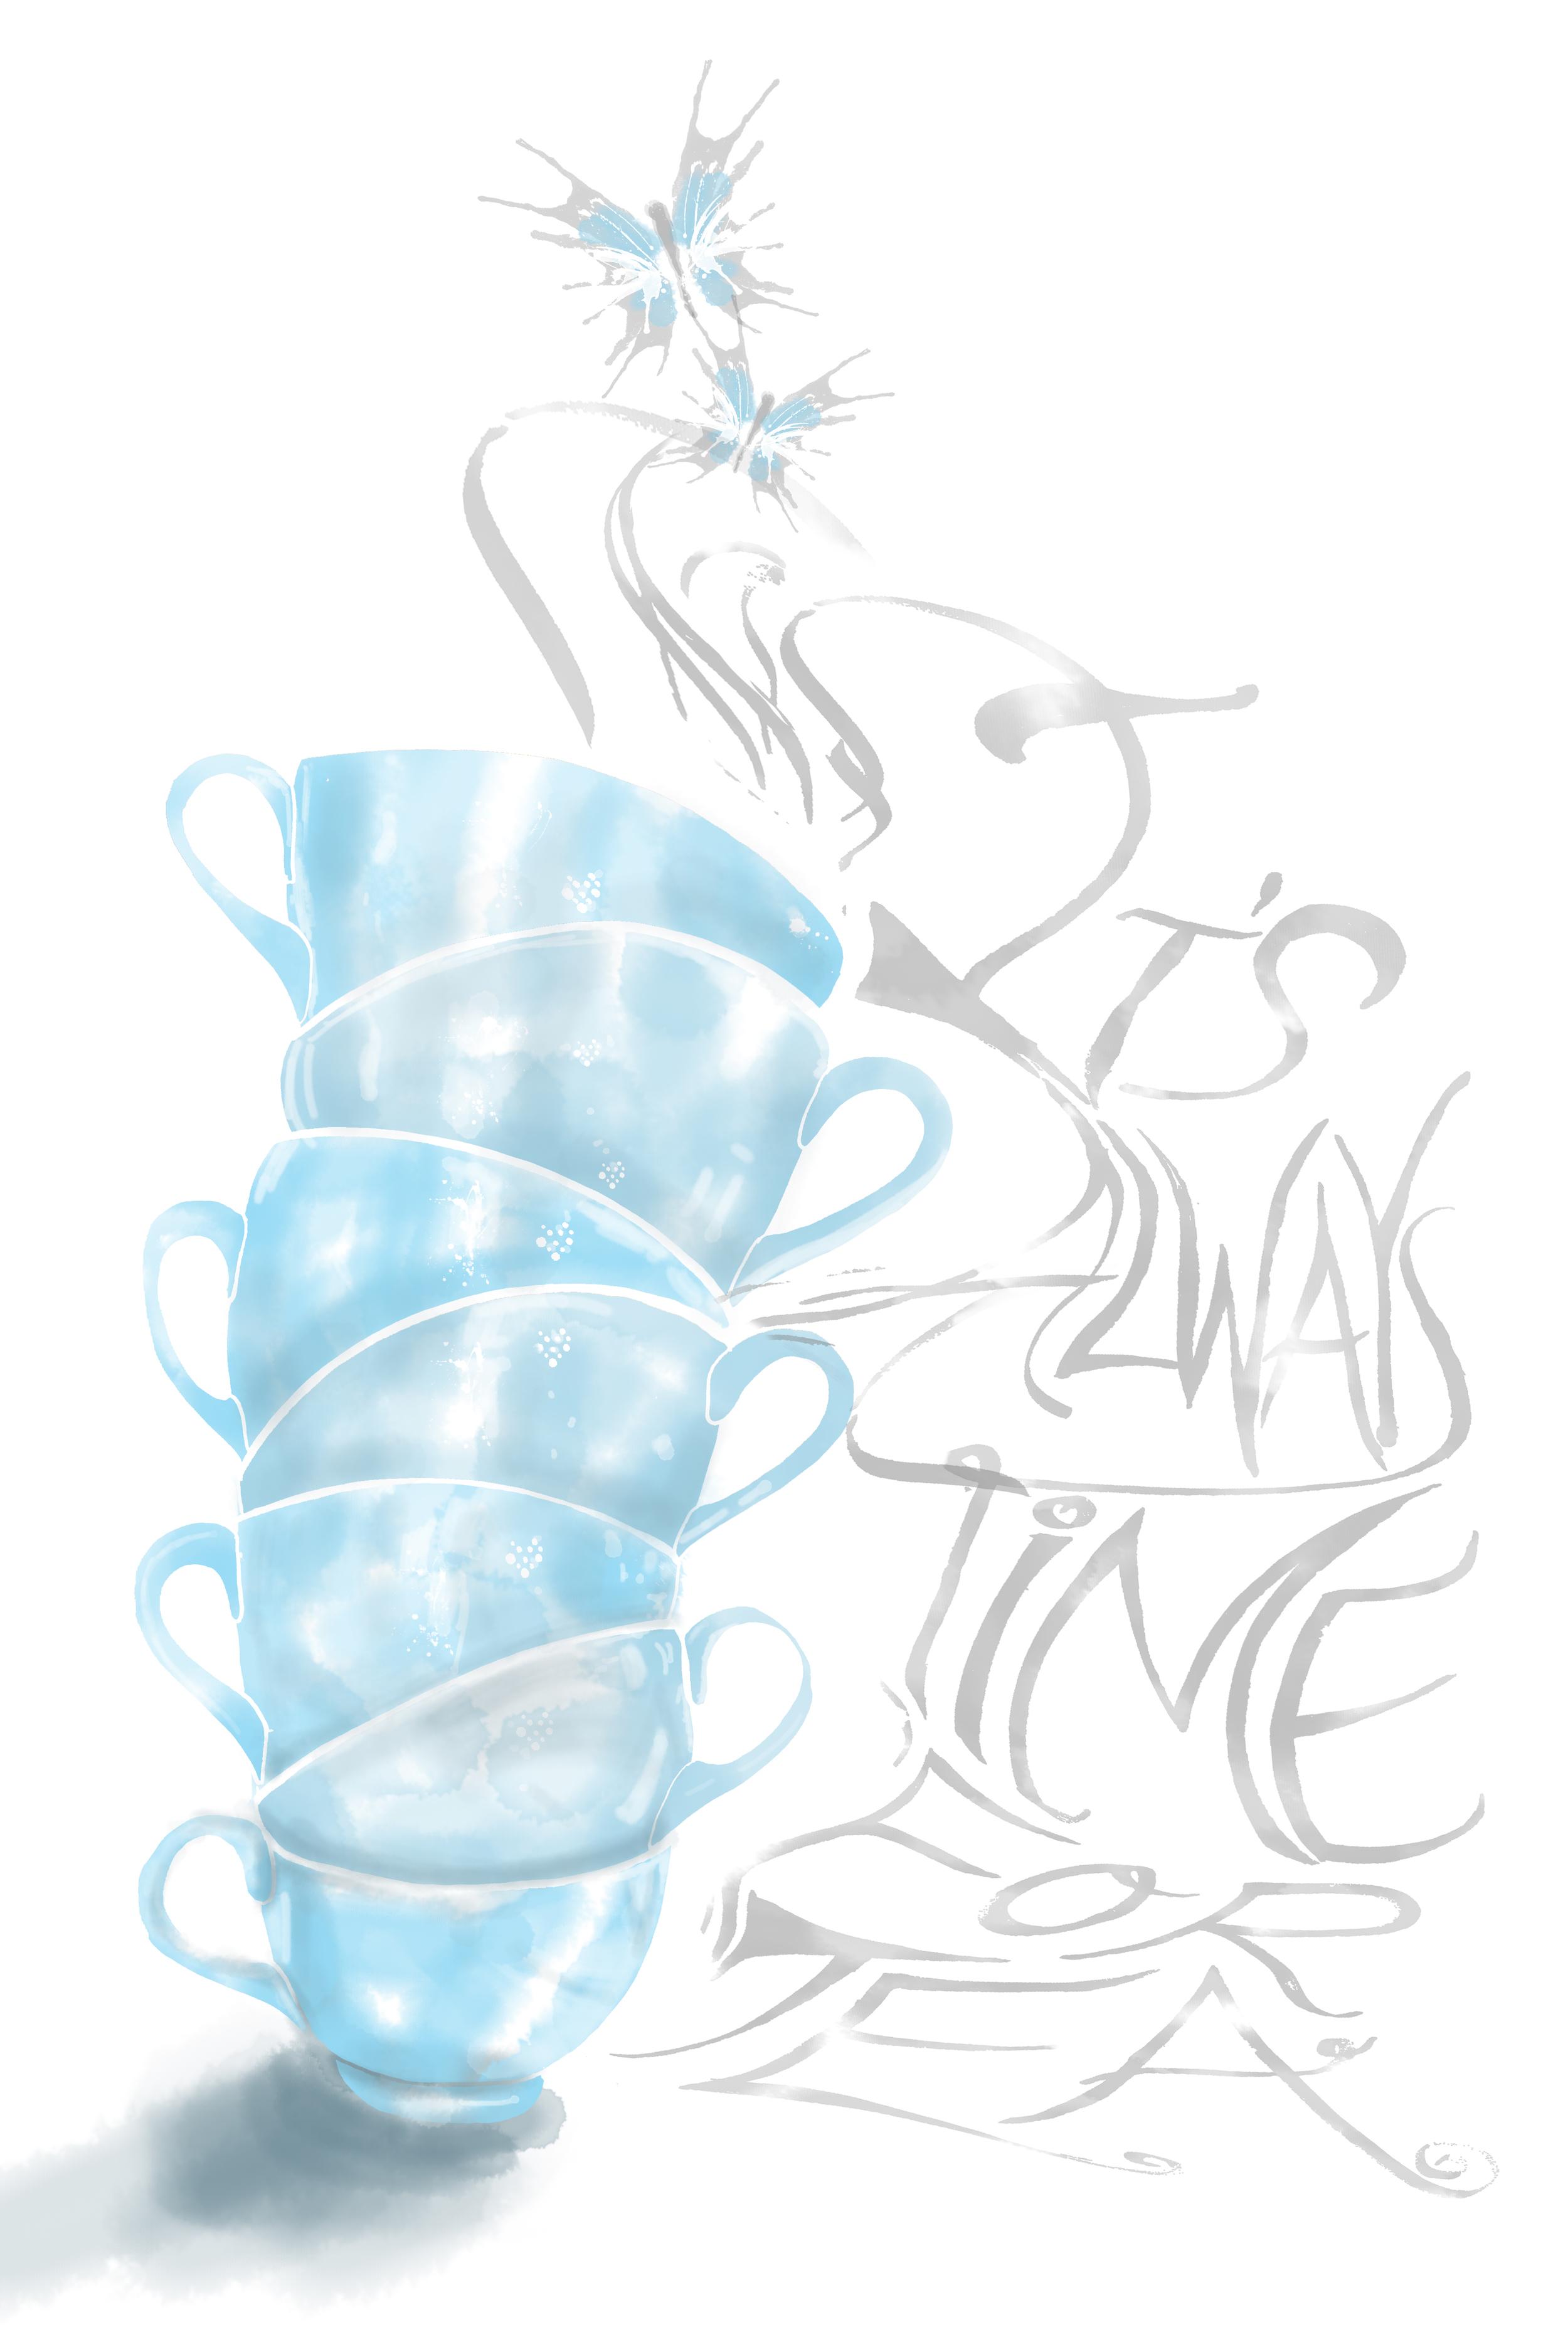 Teacups & writing.jpg